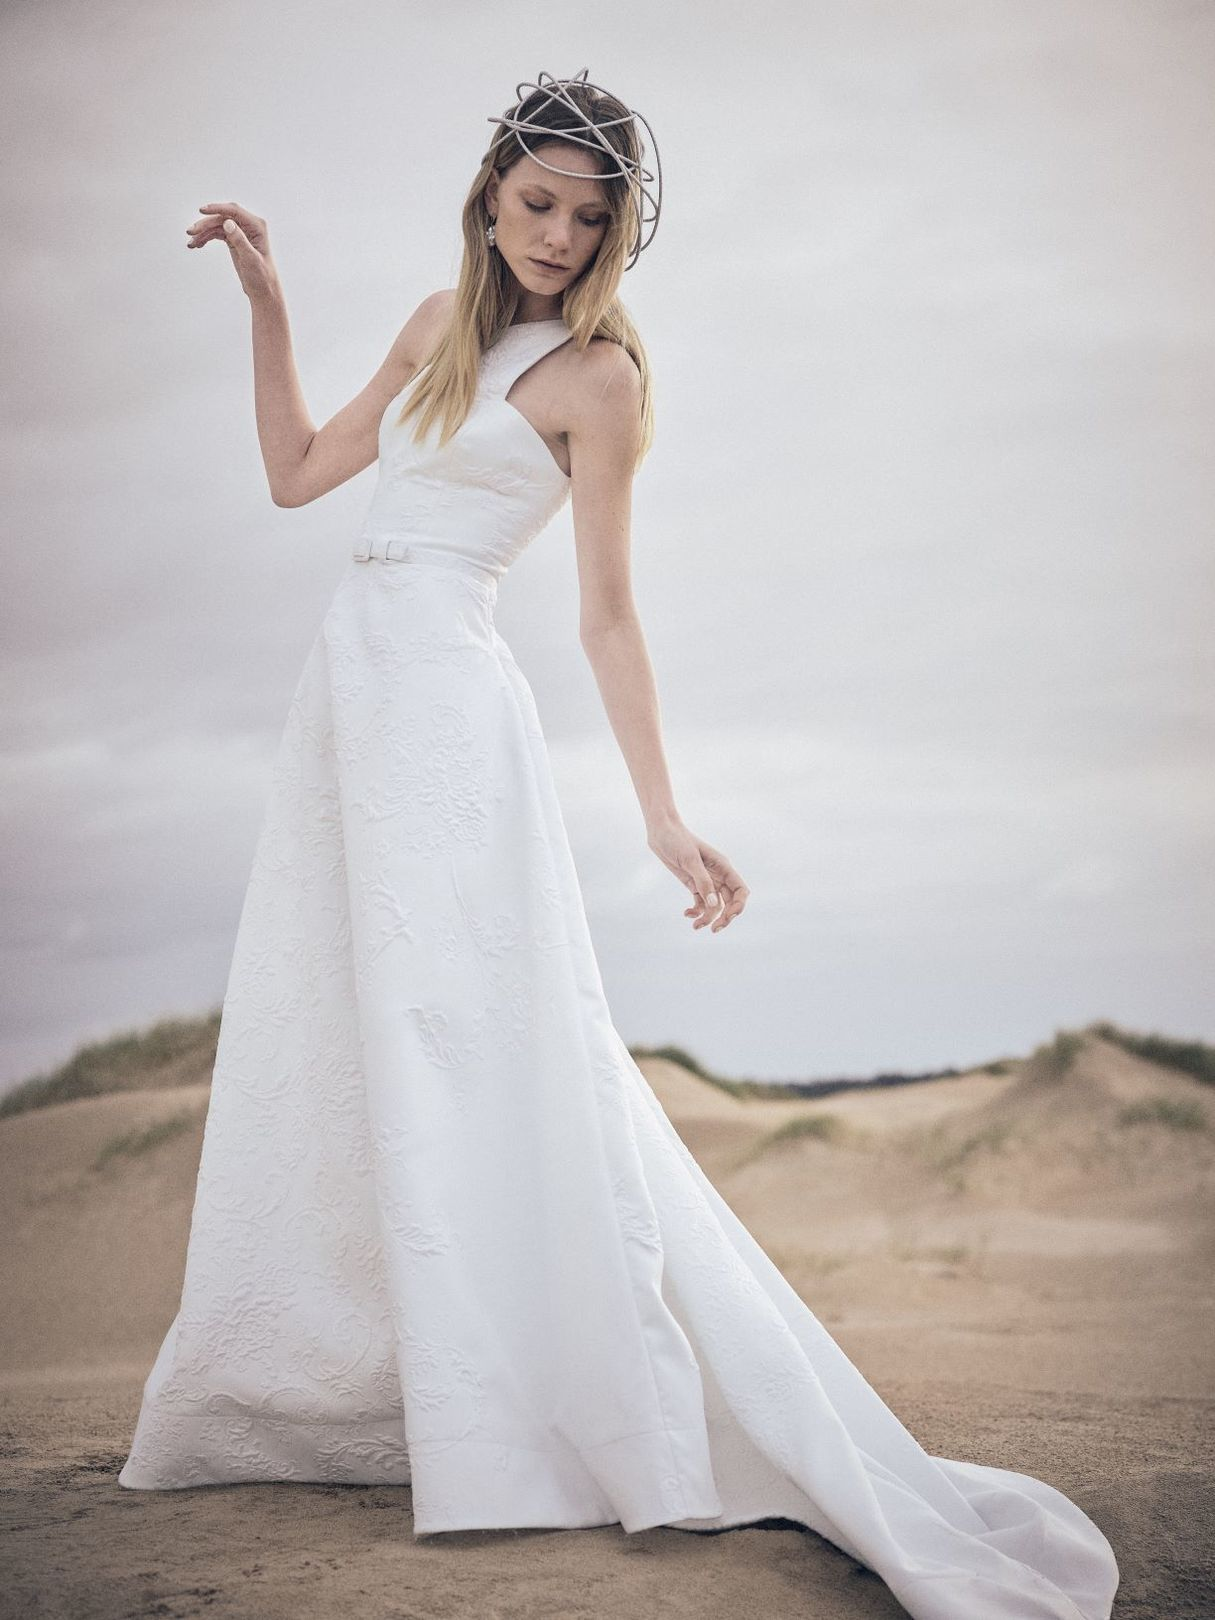 Dress main 2x 1550235899